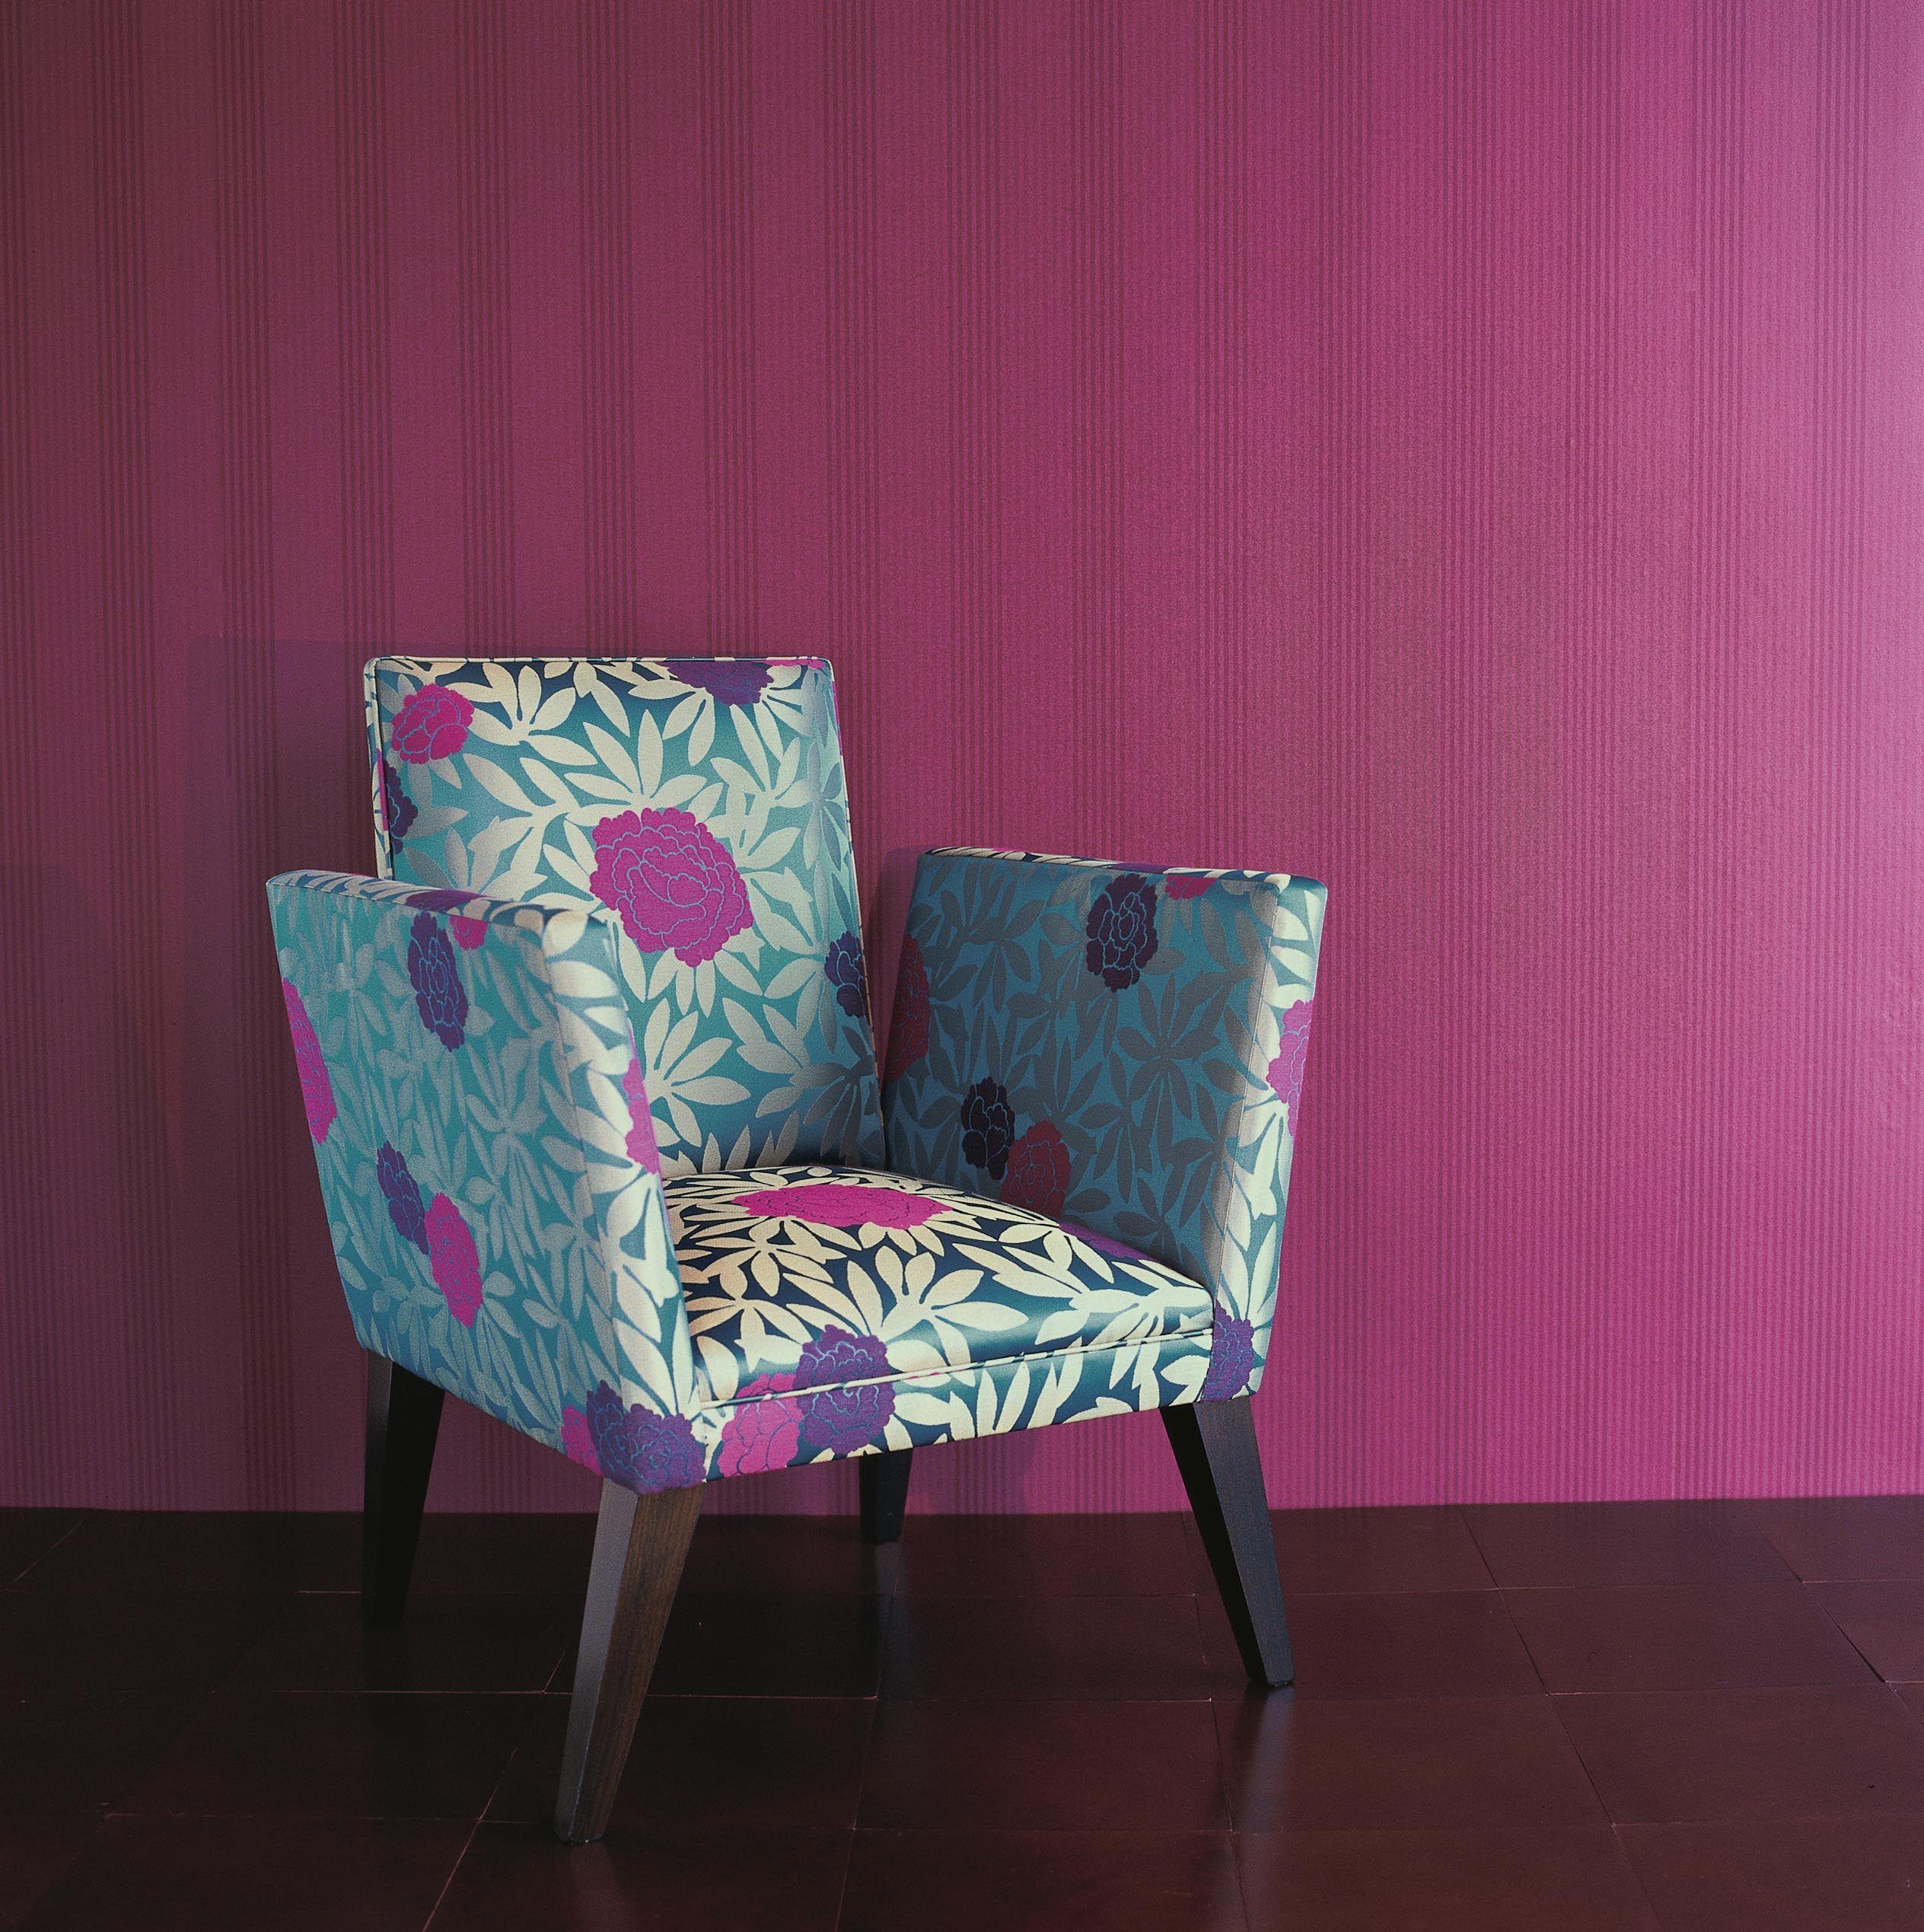 Design and Decoration Awards 2005 - Asuka weave was finalist for Best Fabric Design. www.osborneandlittle.com